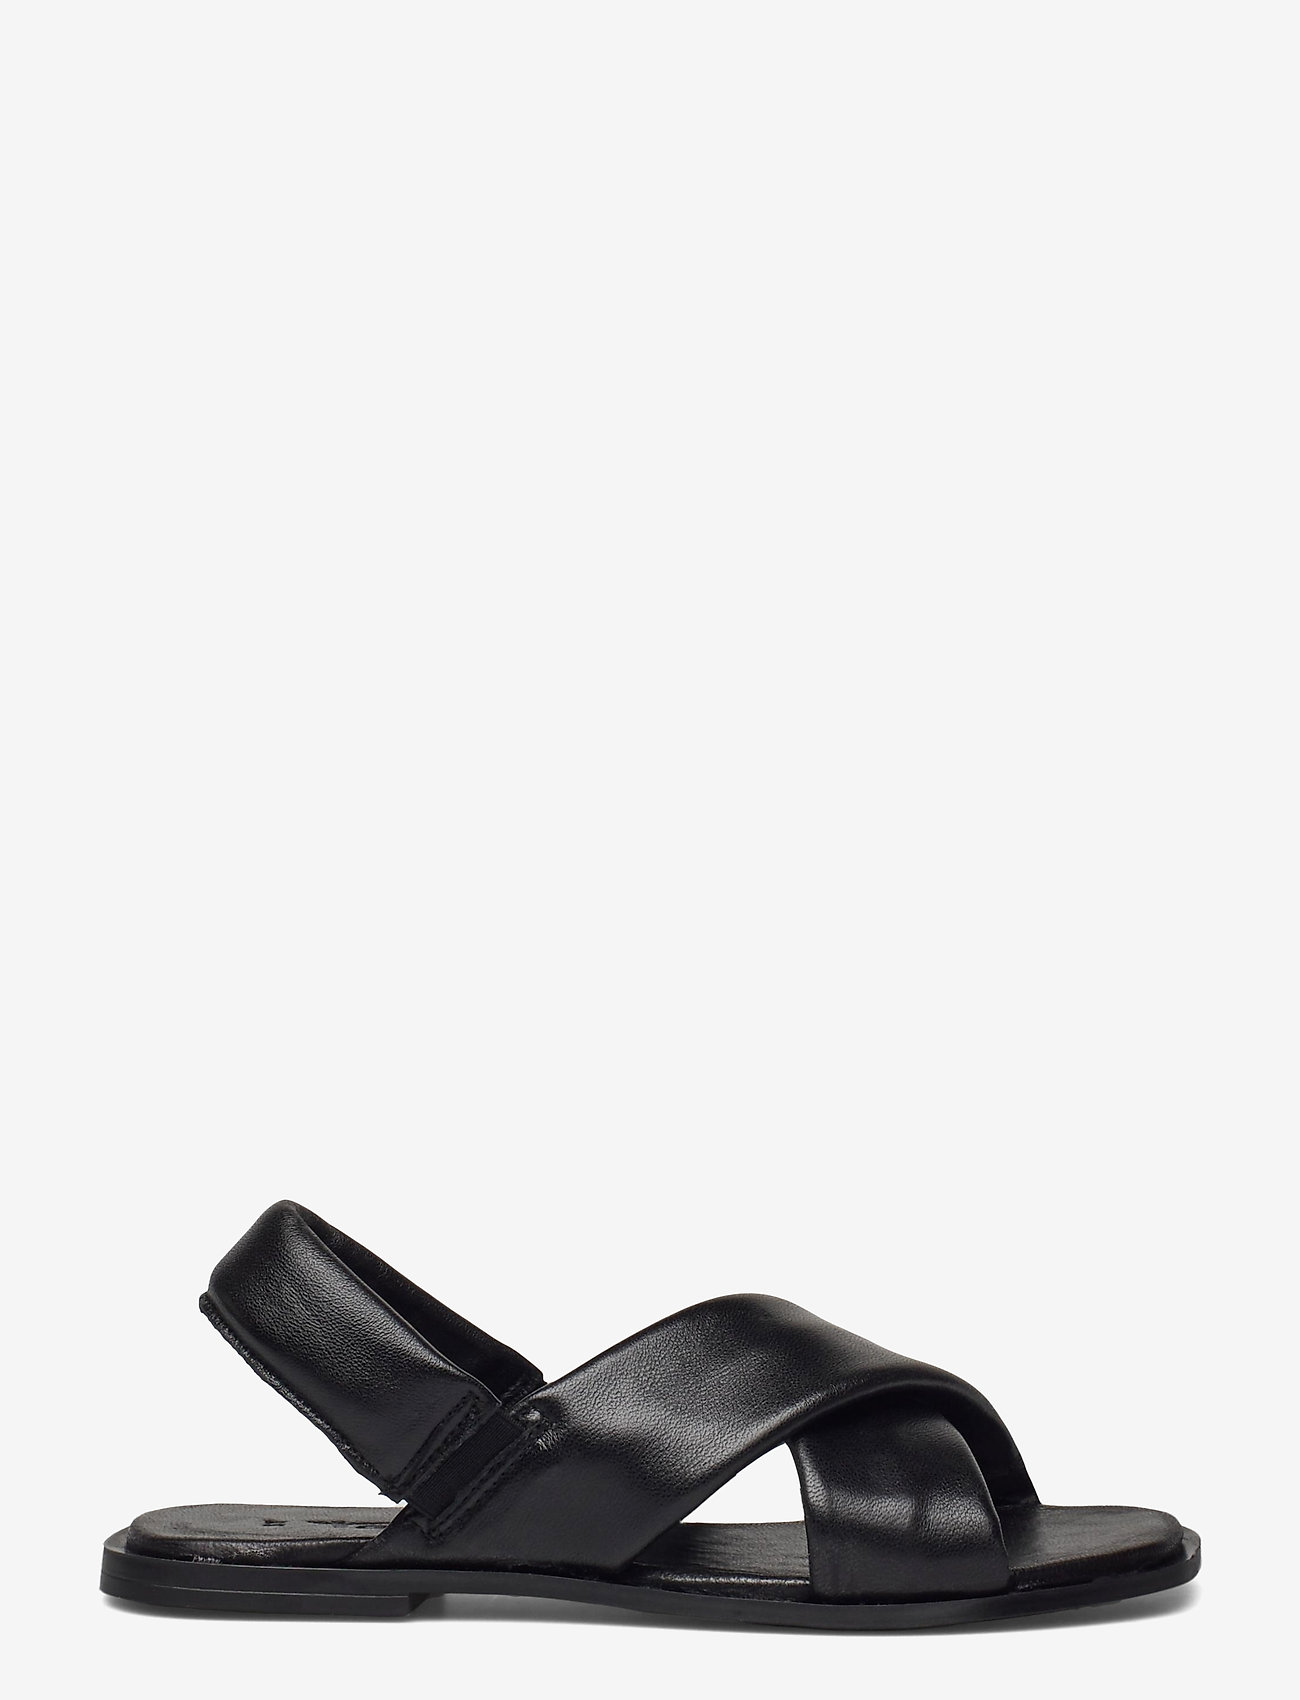 Tamaris - Woms Sandals - sandales - black leather - 1